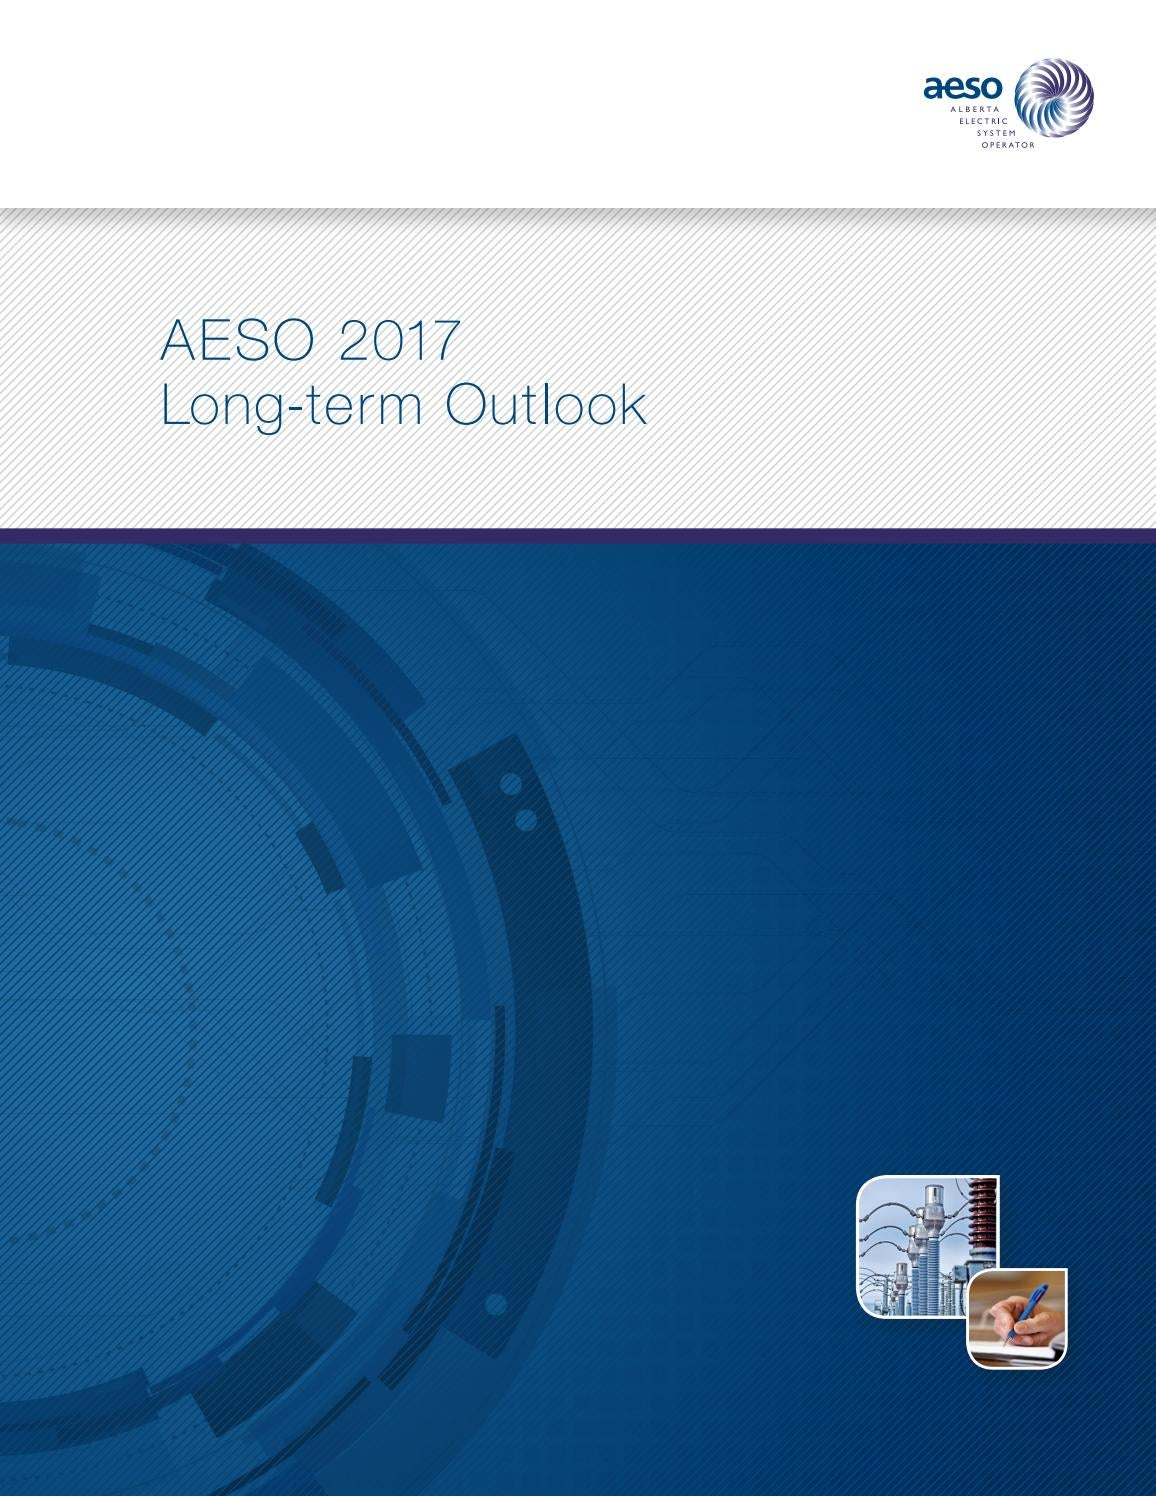 AESO 2017 Long-term Outlook by Kanaga Gnana - issuu